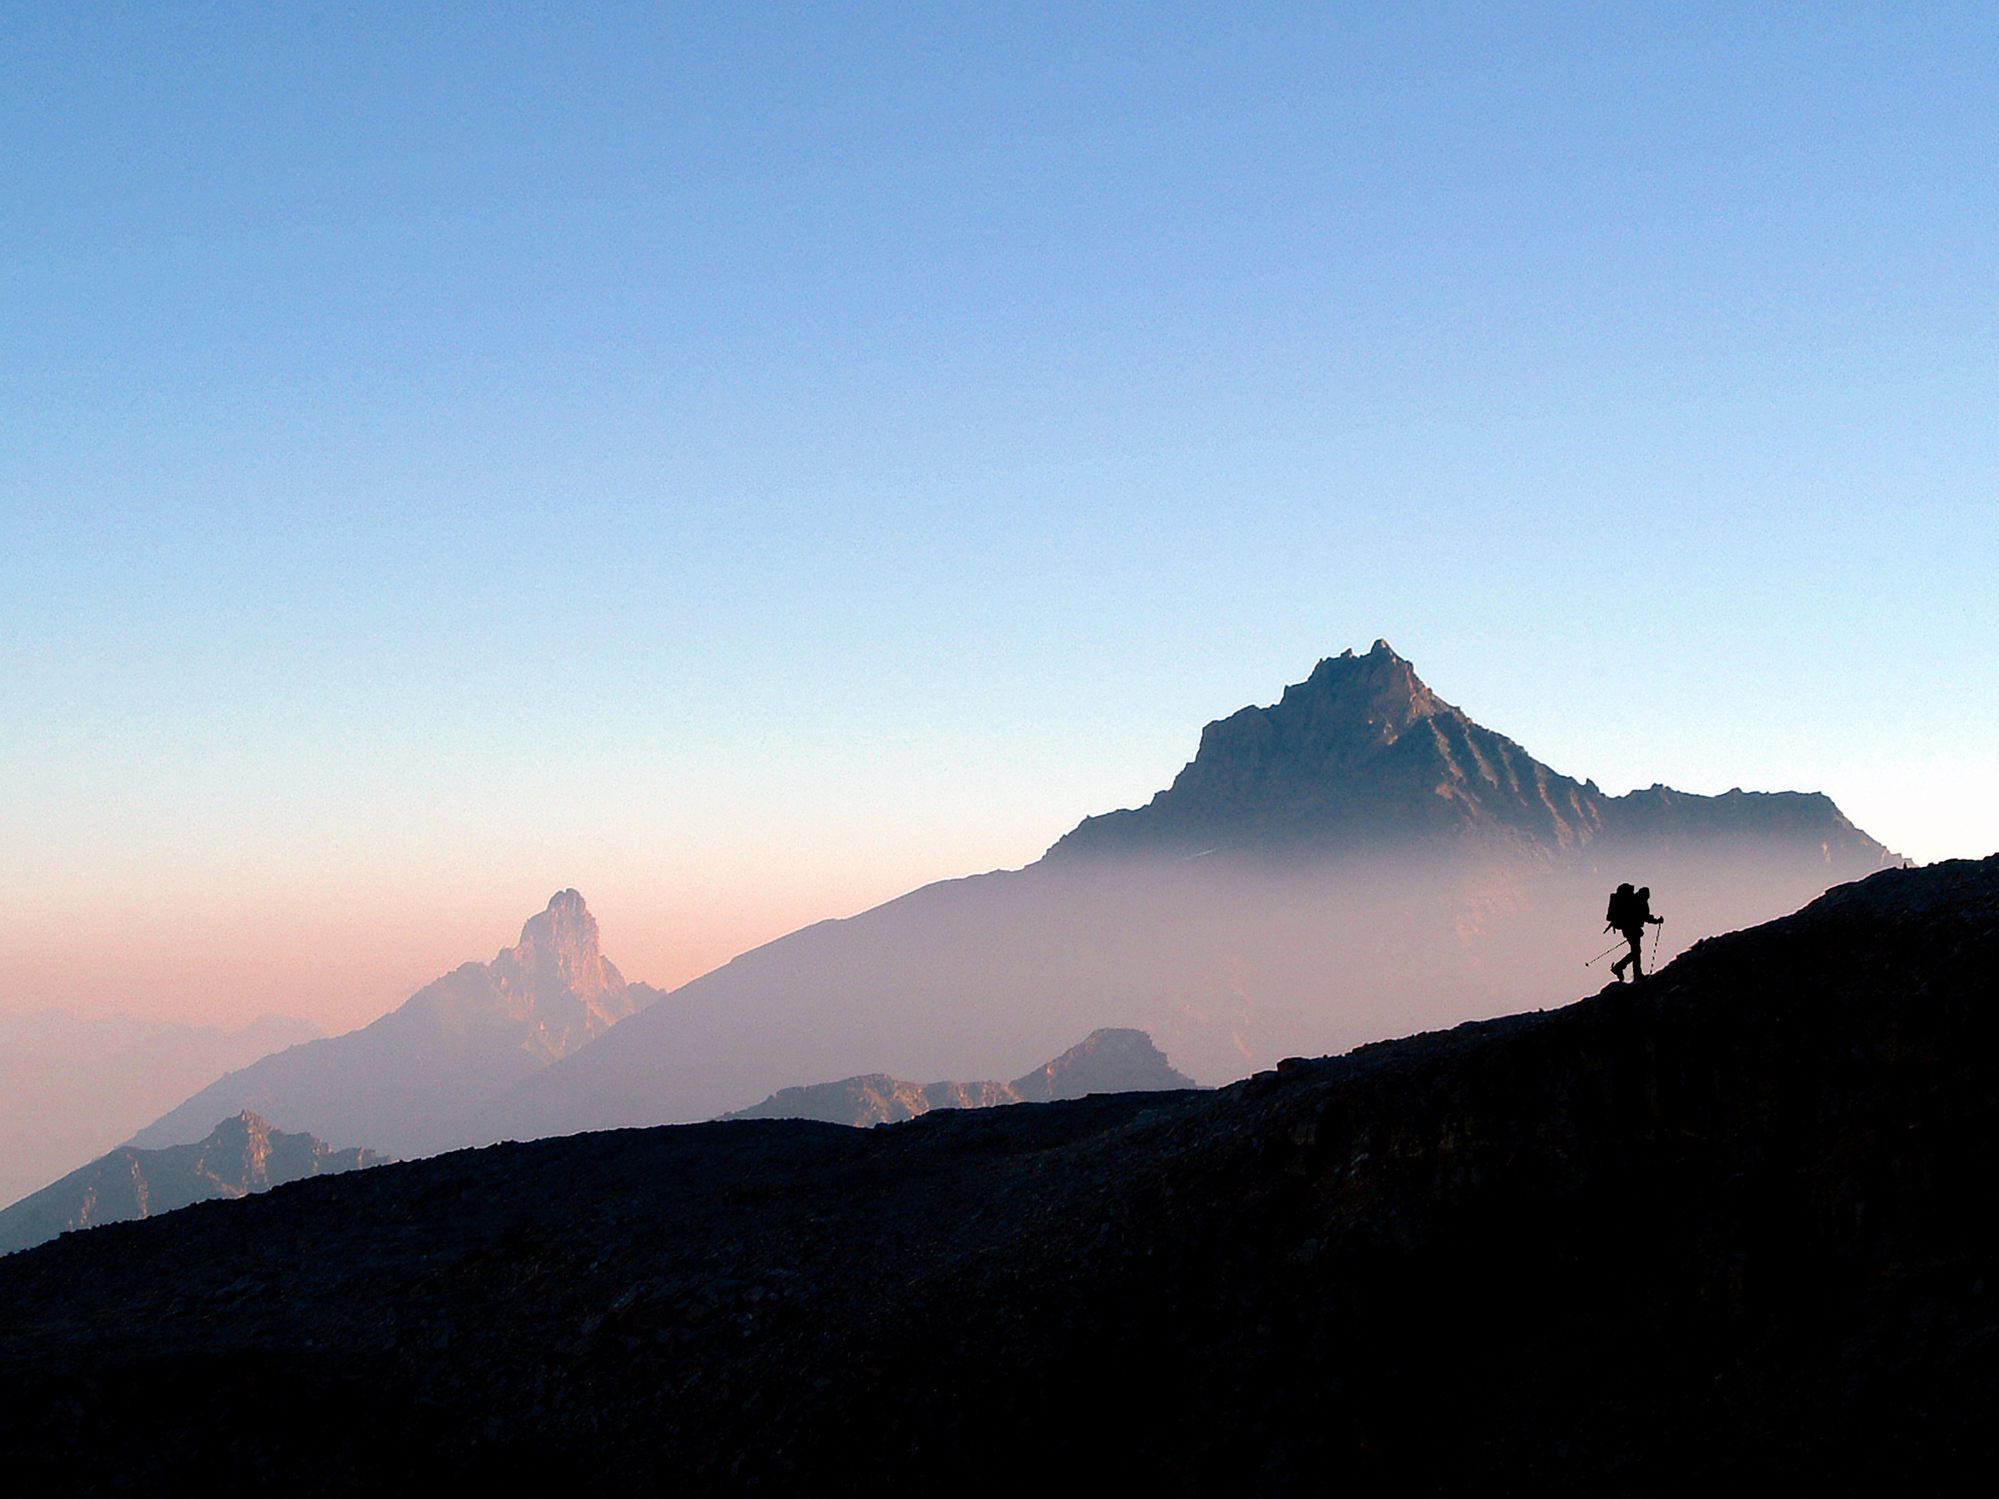 Aosta vallei, wandelen, italië, bergen, vakantie